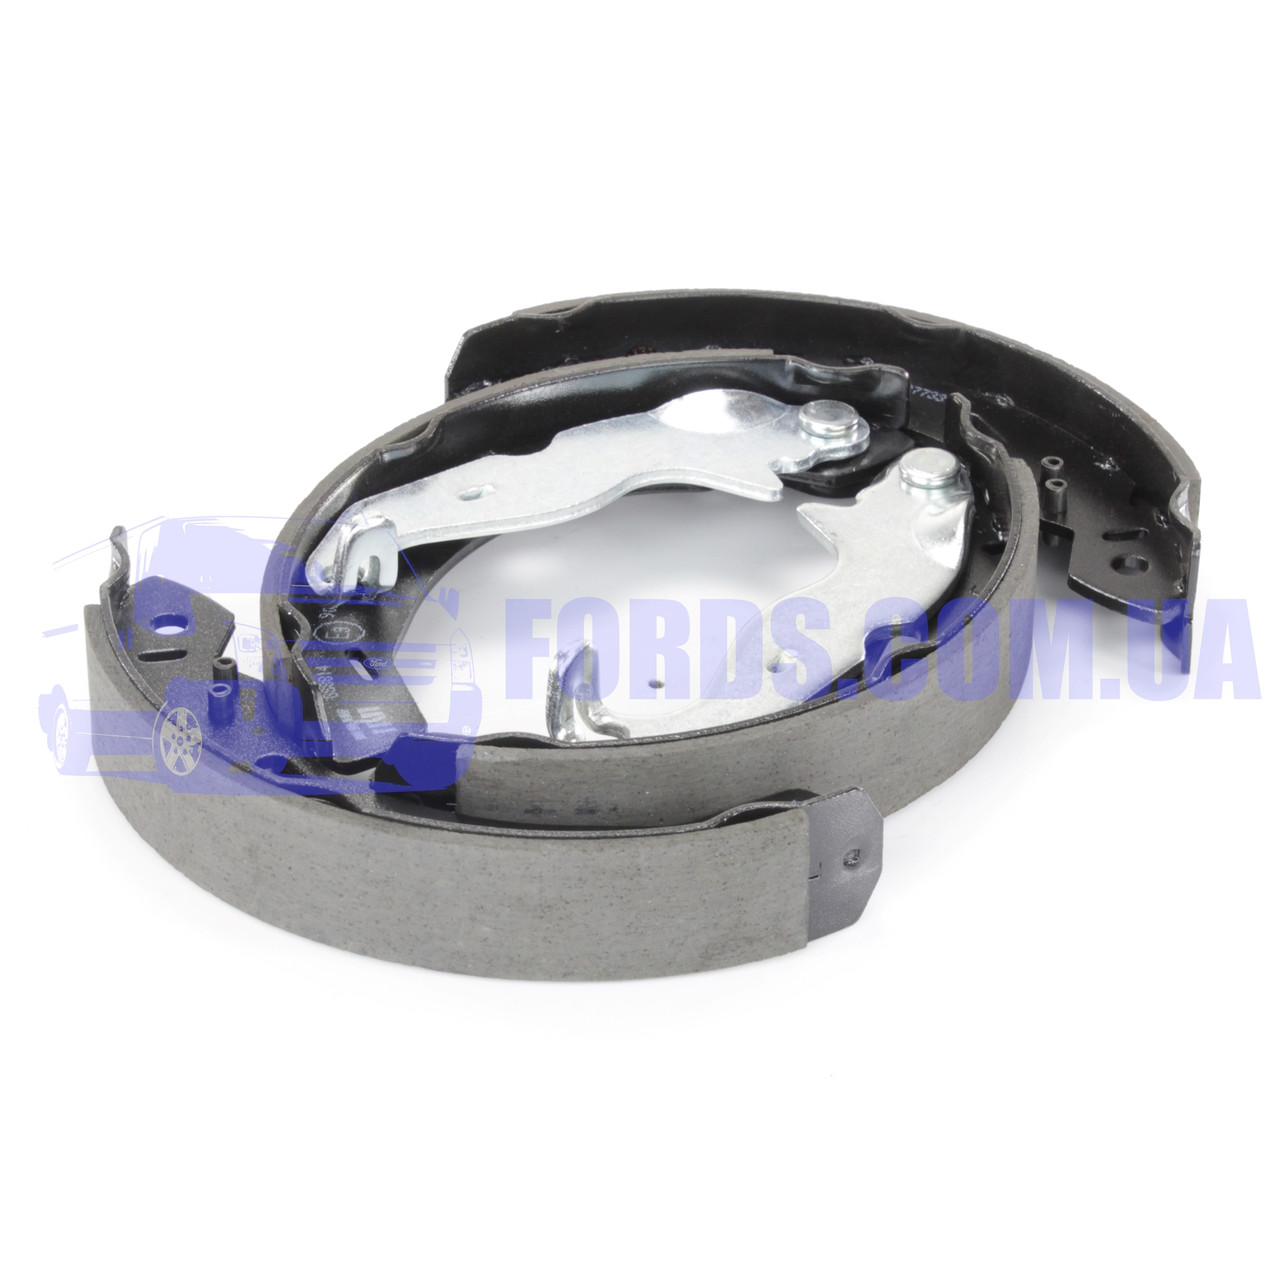 Колодки тормозные задние FORD FIESTA 2008- (1802623/8V512200AD/GS8814) TRW